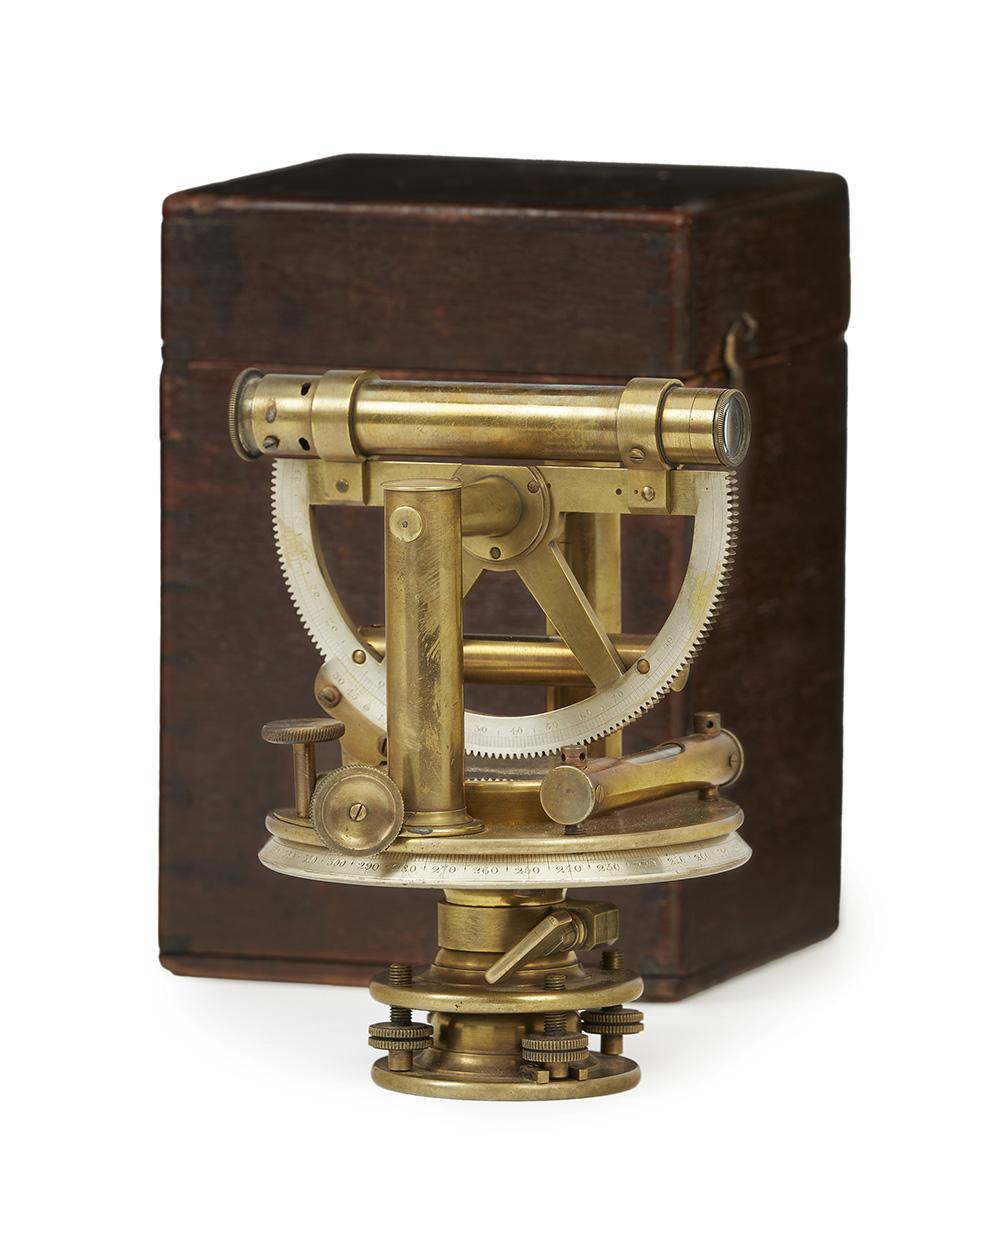 A Thomas Jones brass theodolite